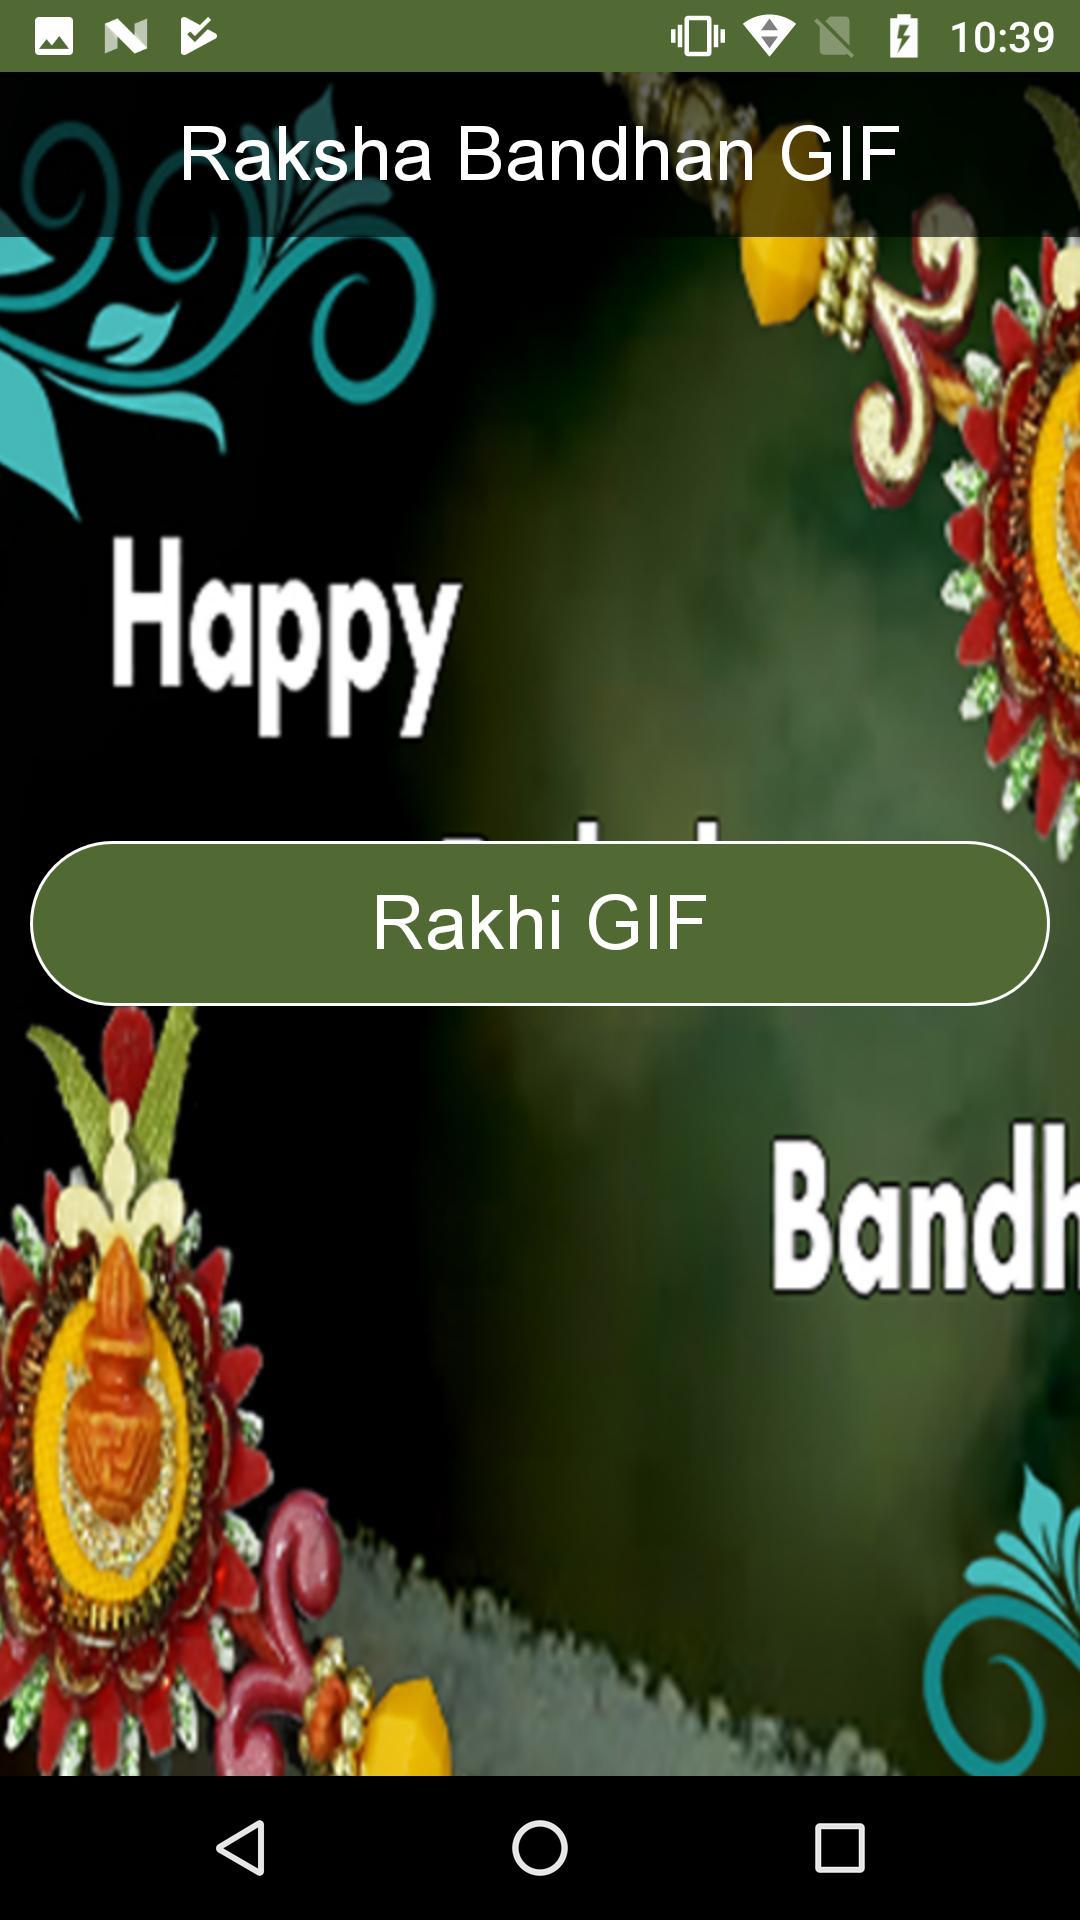 GIF of Rakshabandhan 2017 New poster